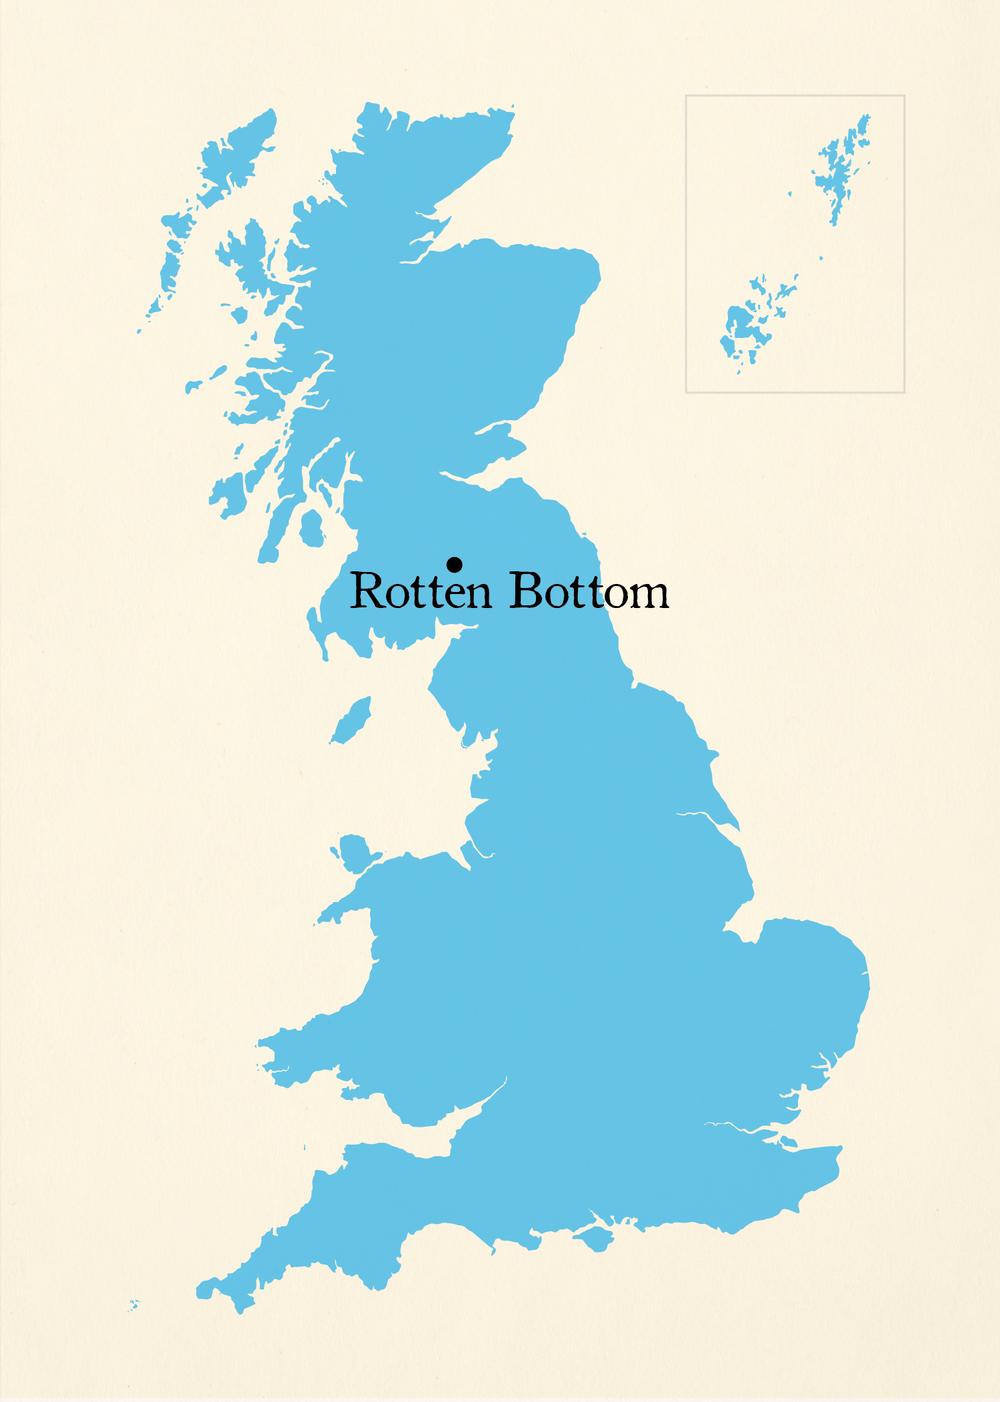 Rotten Bottom